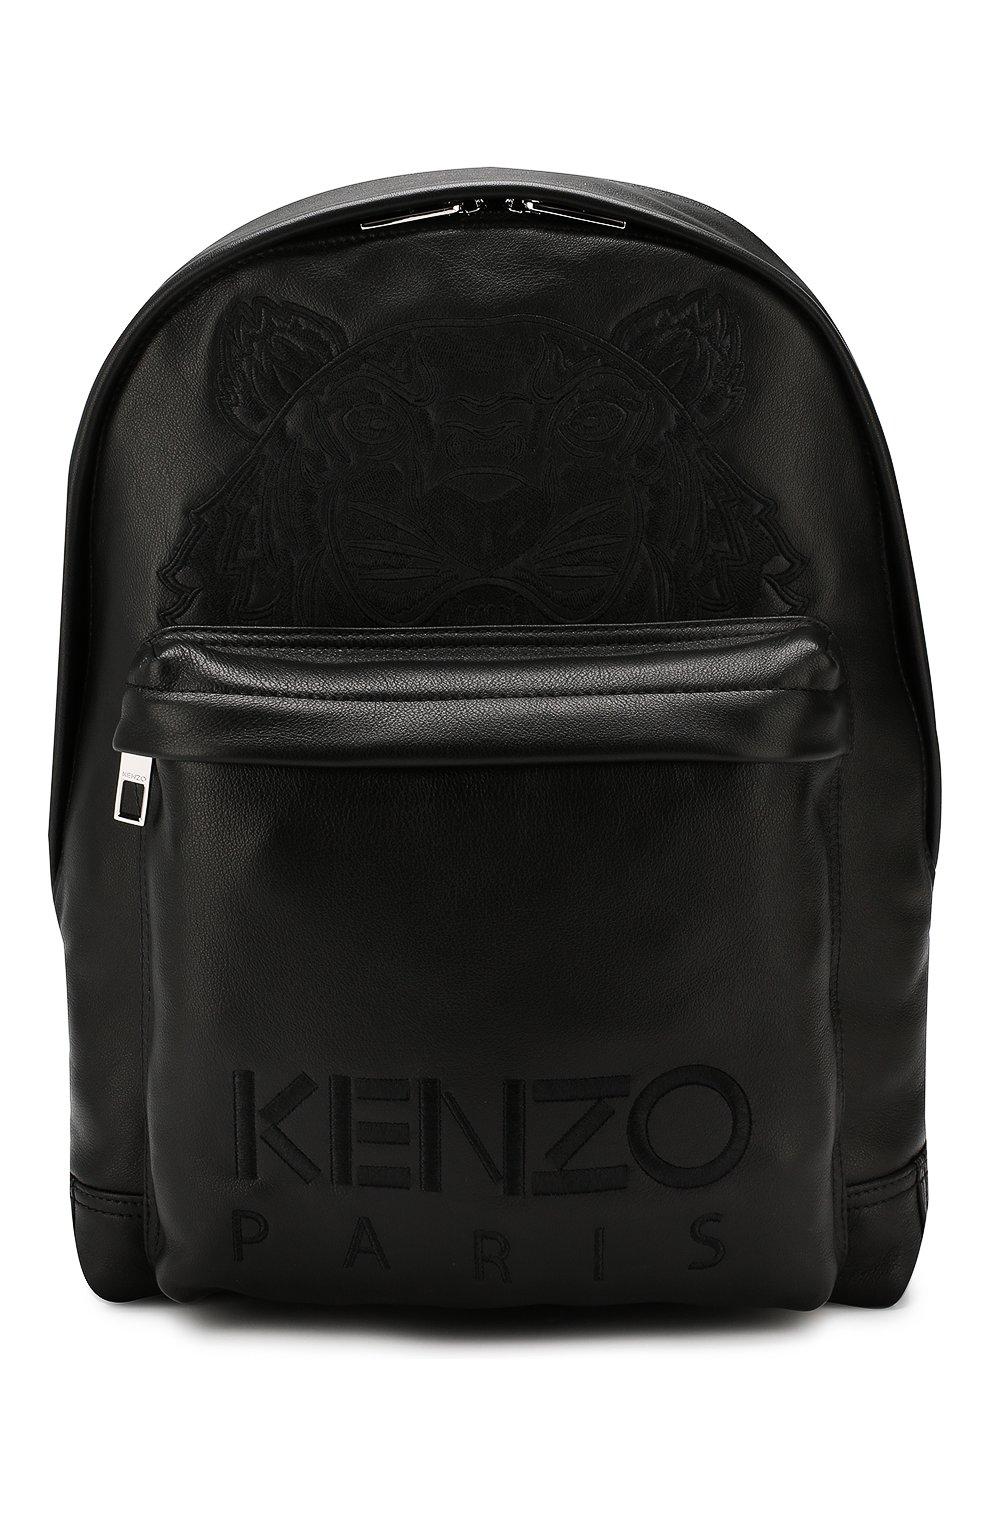 Мужской кожаный рюкзак KENZO черного цвета, арт. F865SF300L49   Фото 1